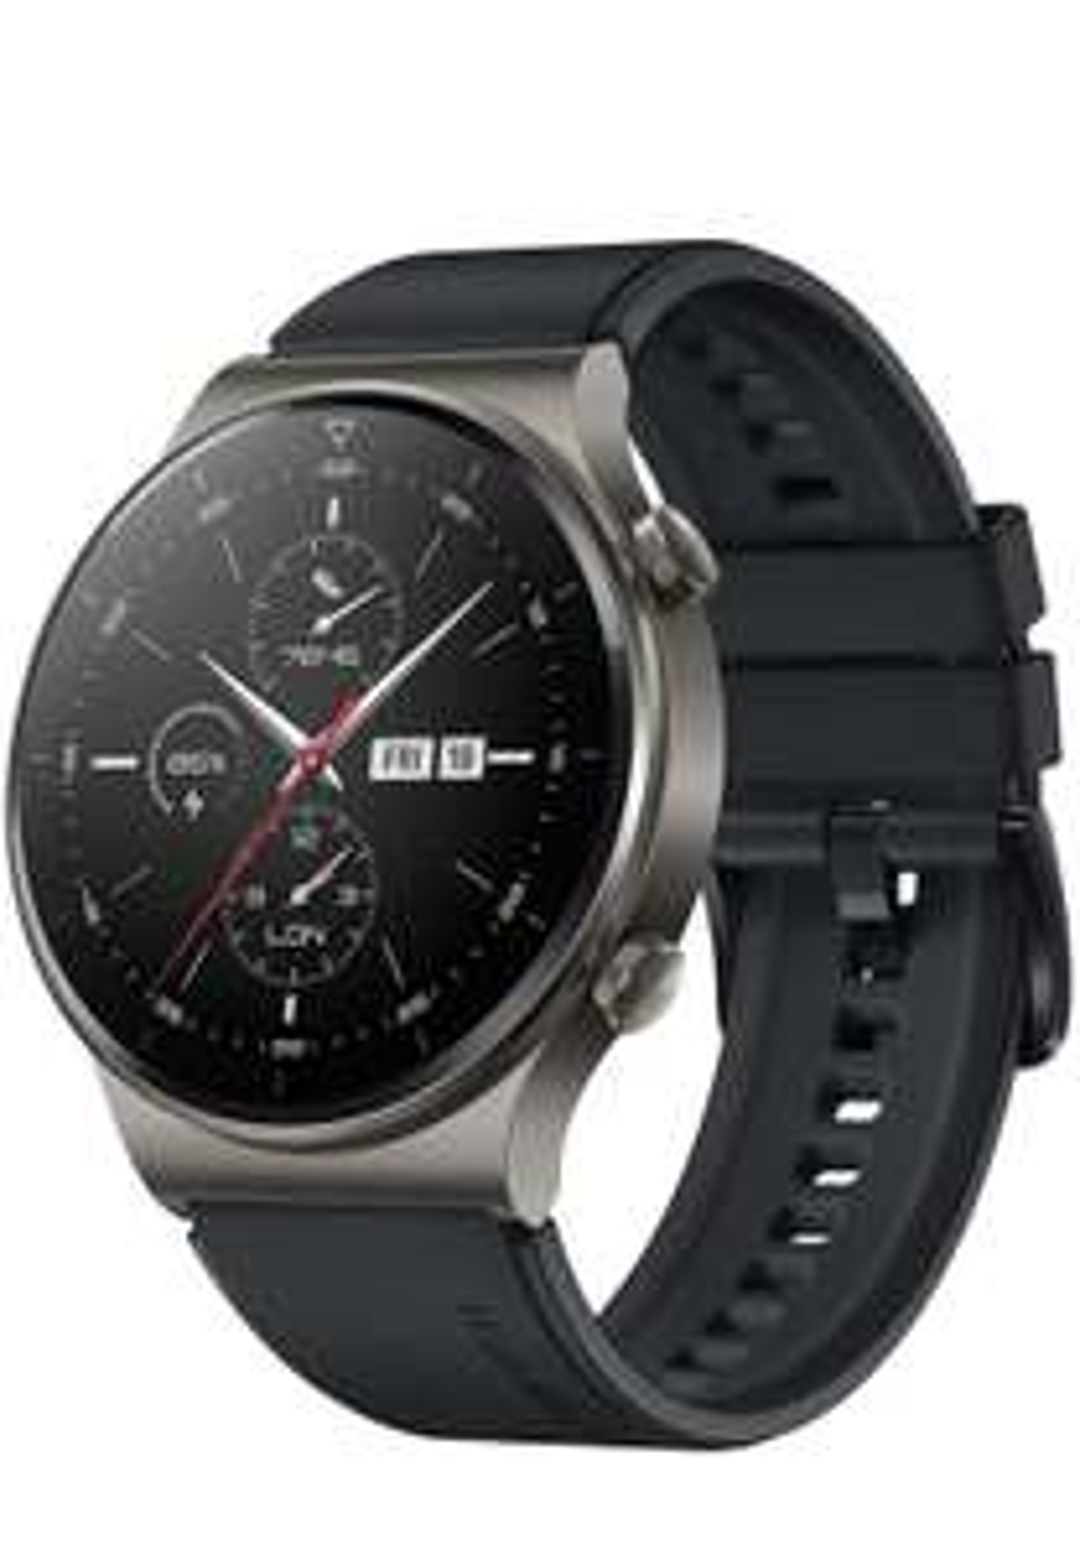 [Gomibo] [Amazon Prime] Huawei Watch GT 2 Pro schwarz 176,95€/ Grau 161,99€; Huawei Watch GT 2 Elite 151,95